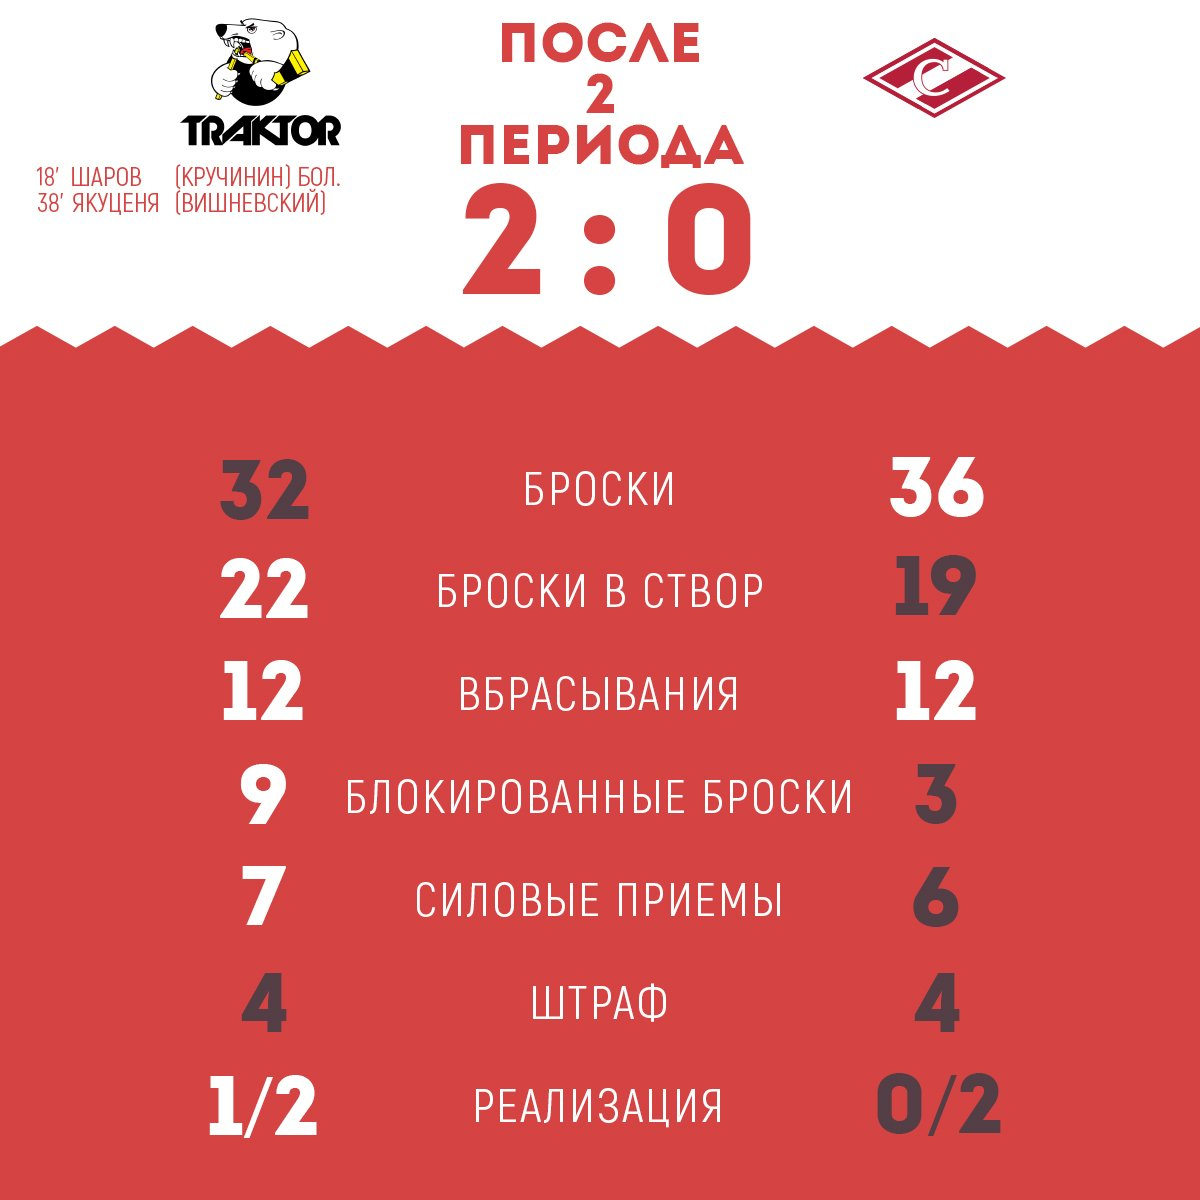 Статистика матча «Трактор» - «Спартак» после 2-х периодов